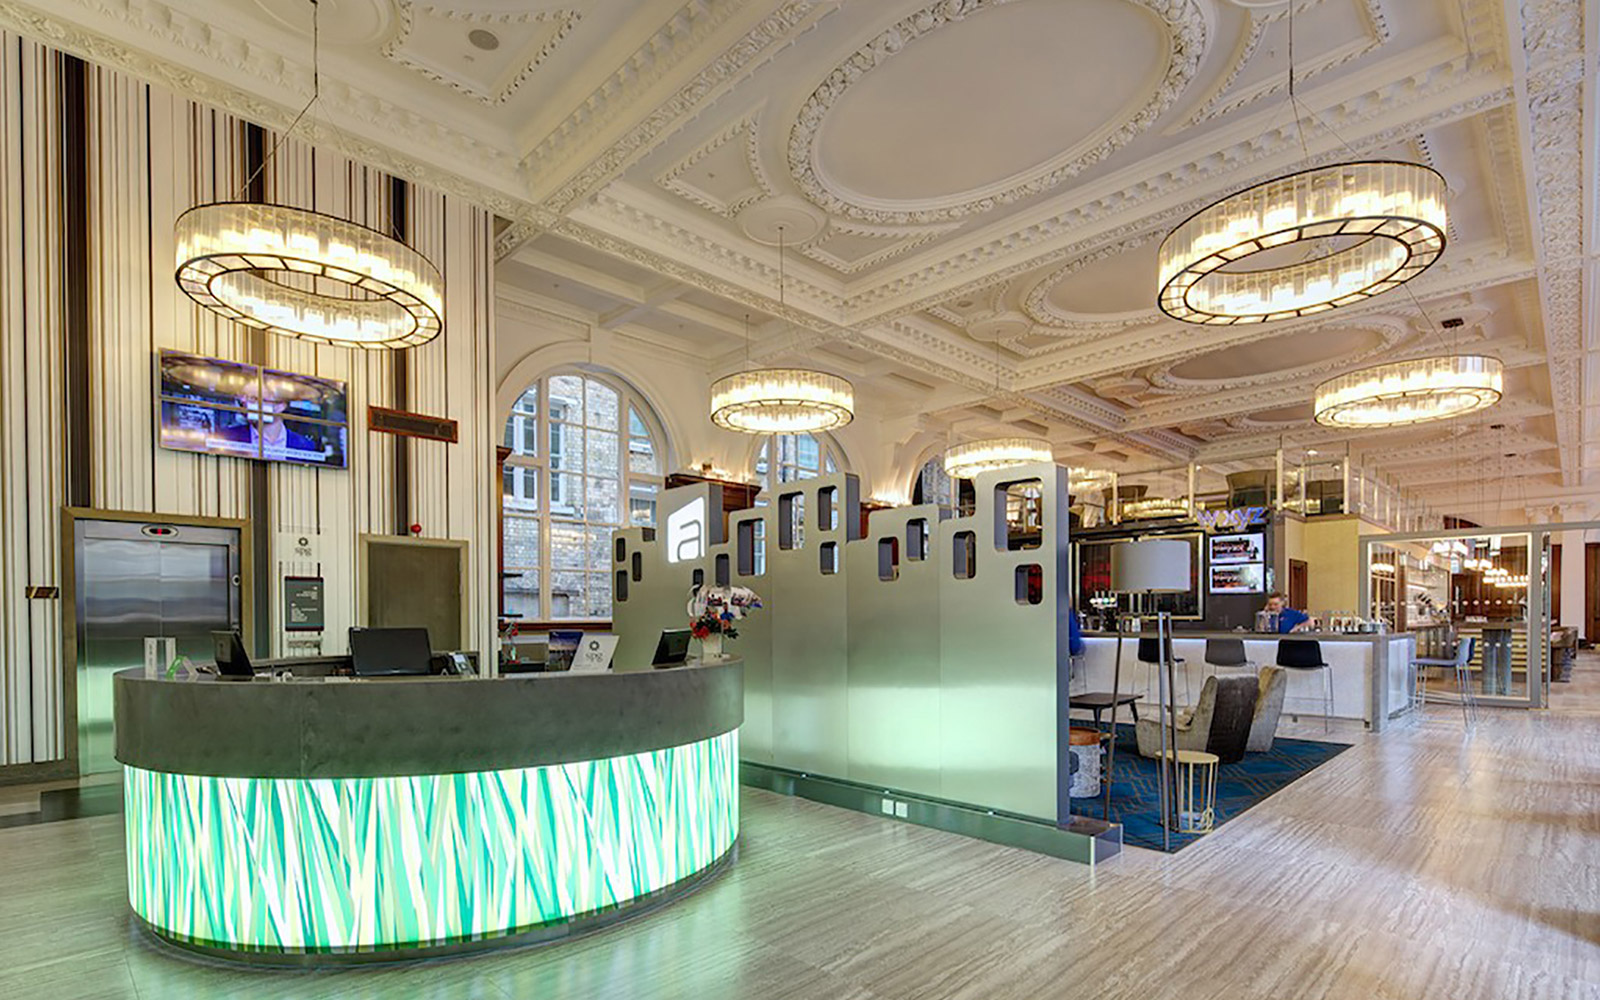 Aloft Hotel - Falconer Chester Hall